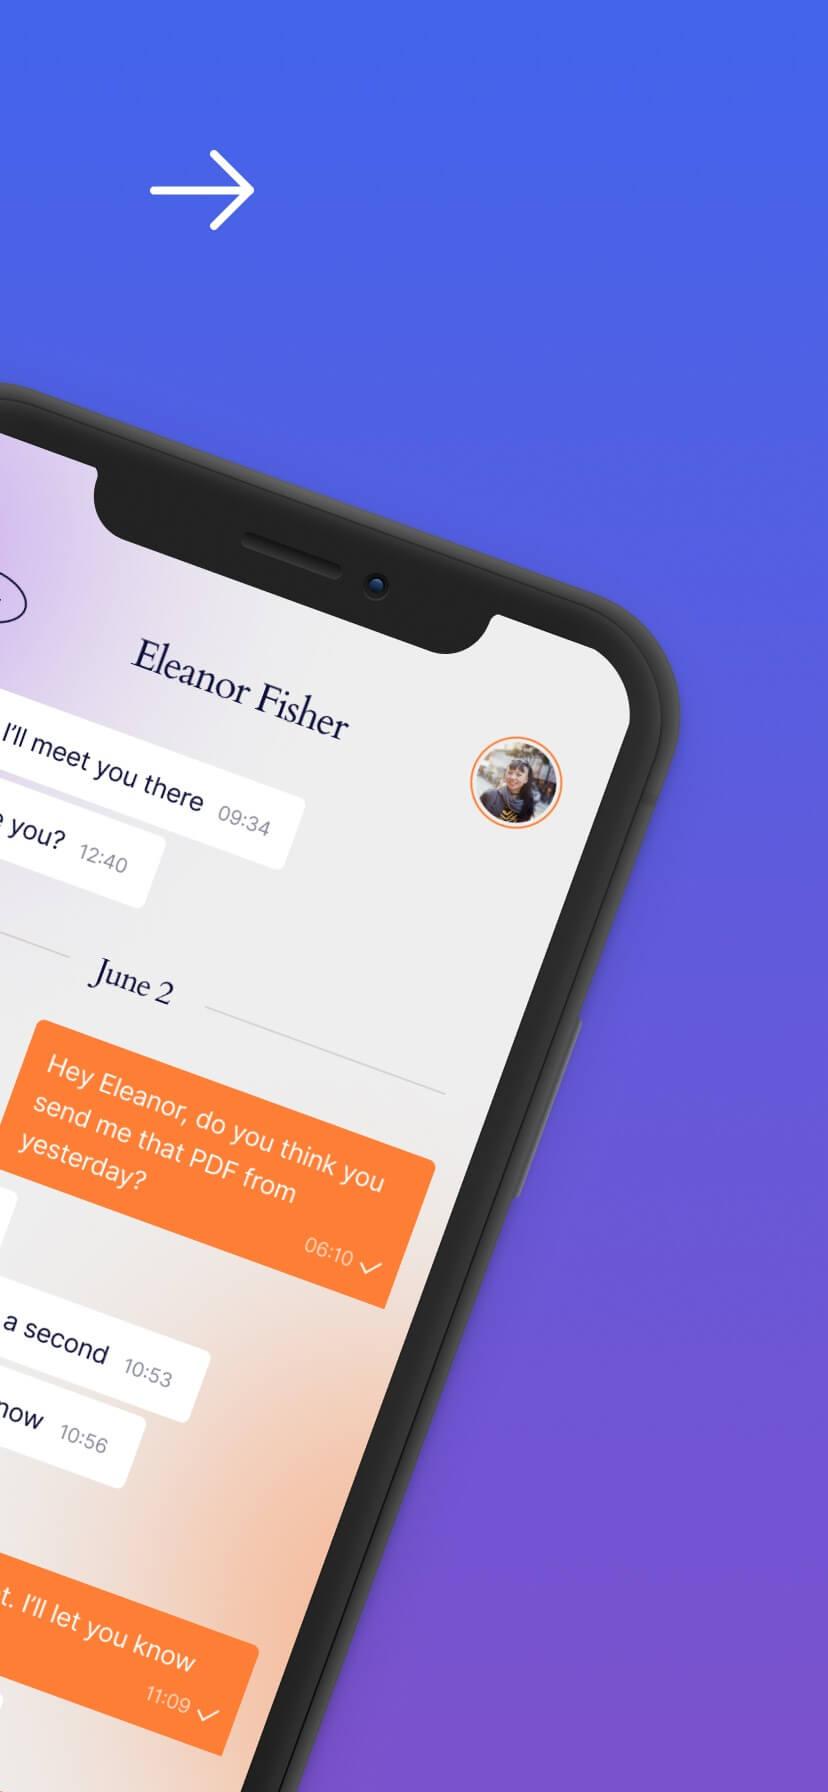 Blue and purple gradient app store screenshot #2